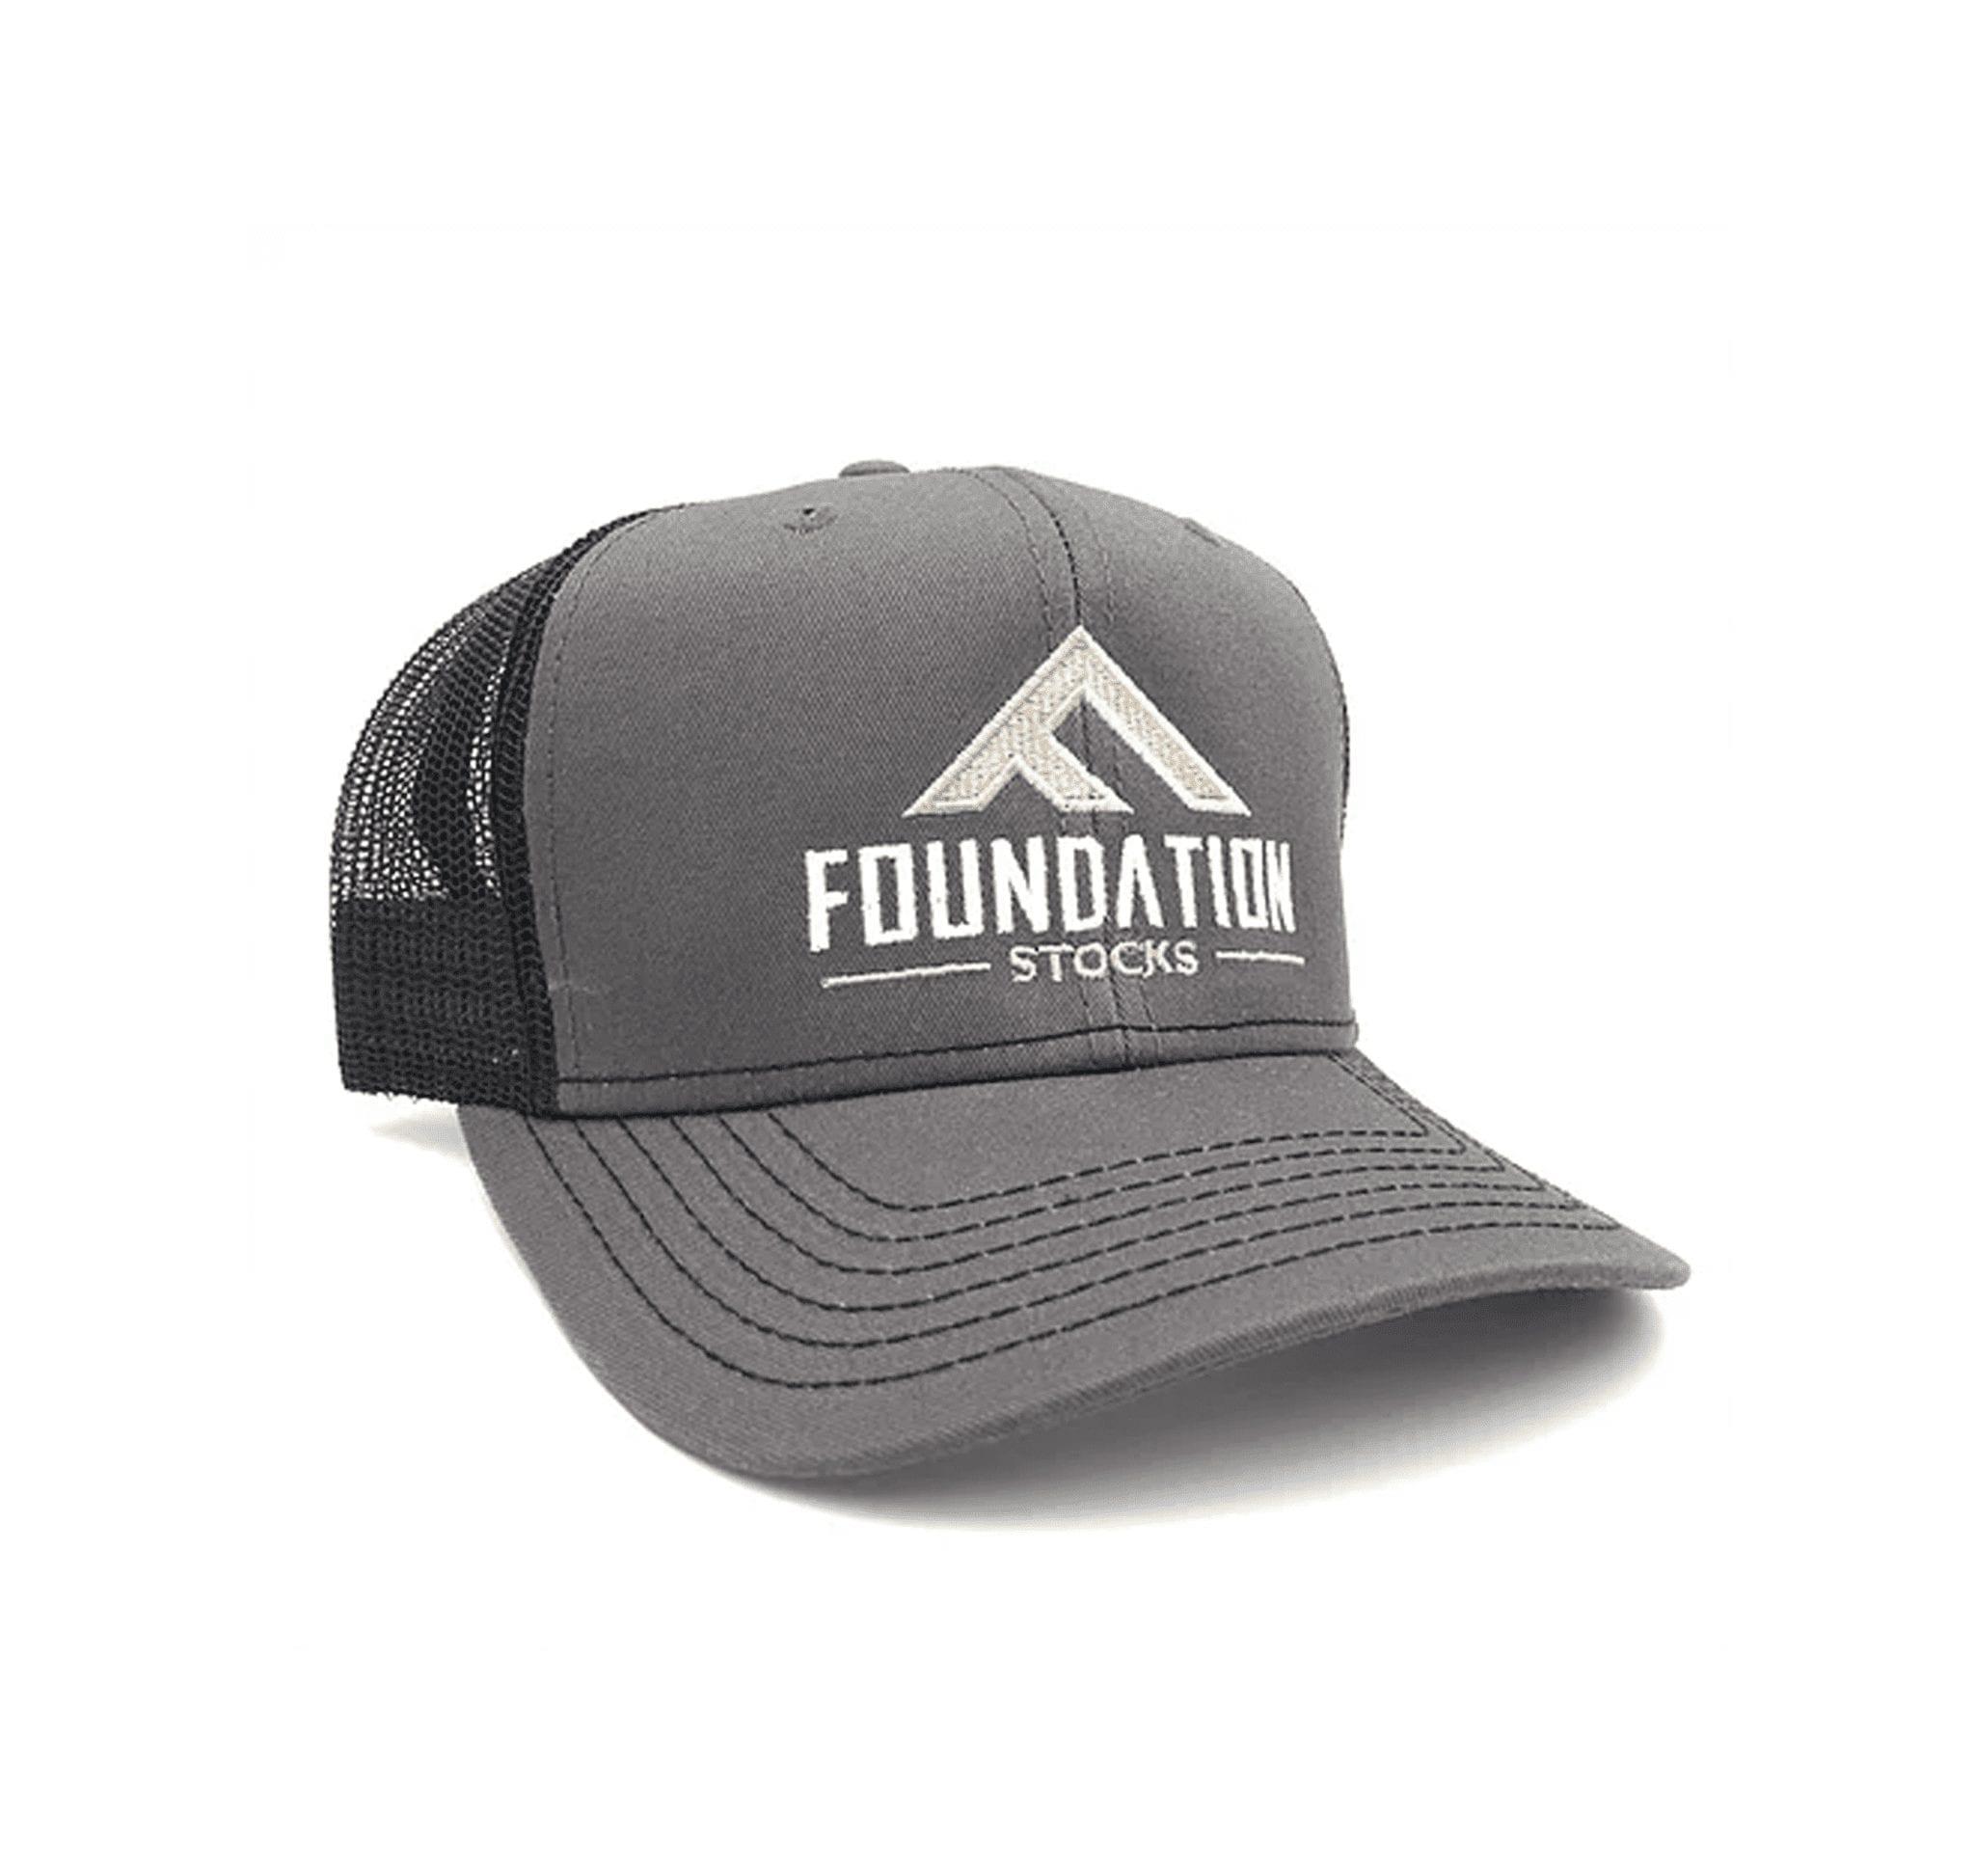 Foundation Stocks Hat